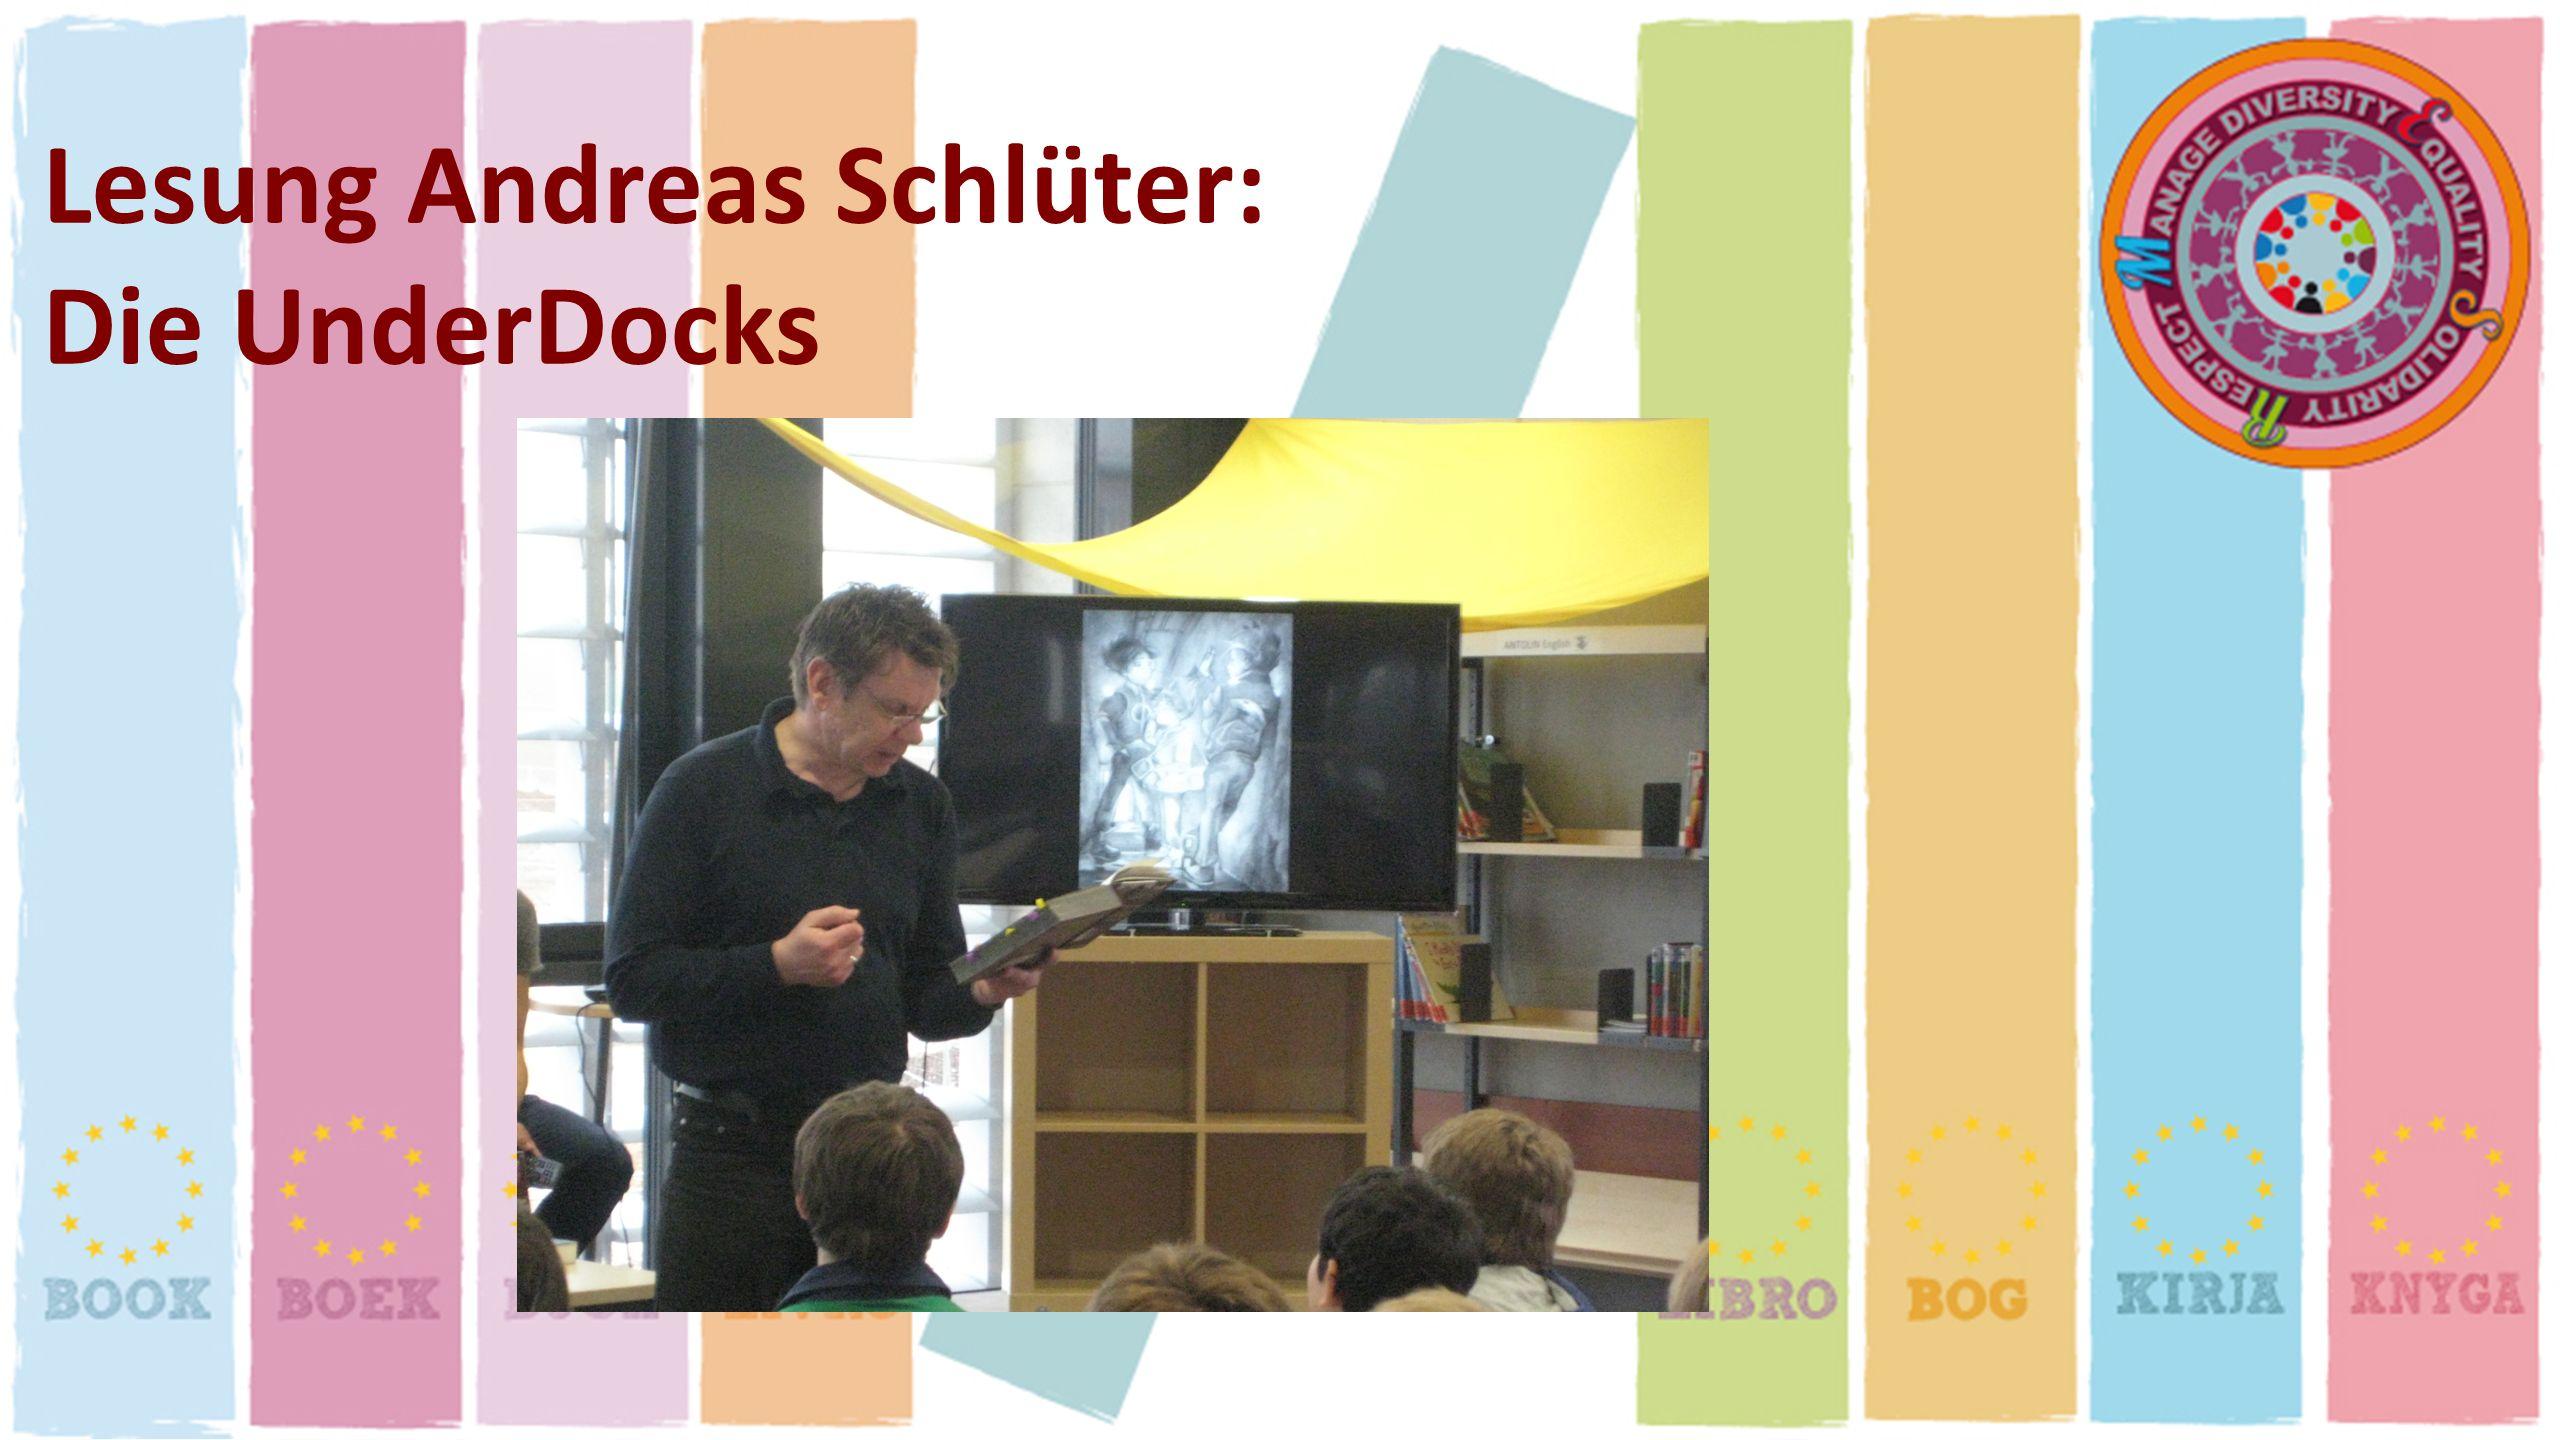 Lesung Andreas Schlüter: Die UnderDocks